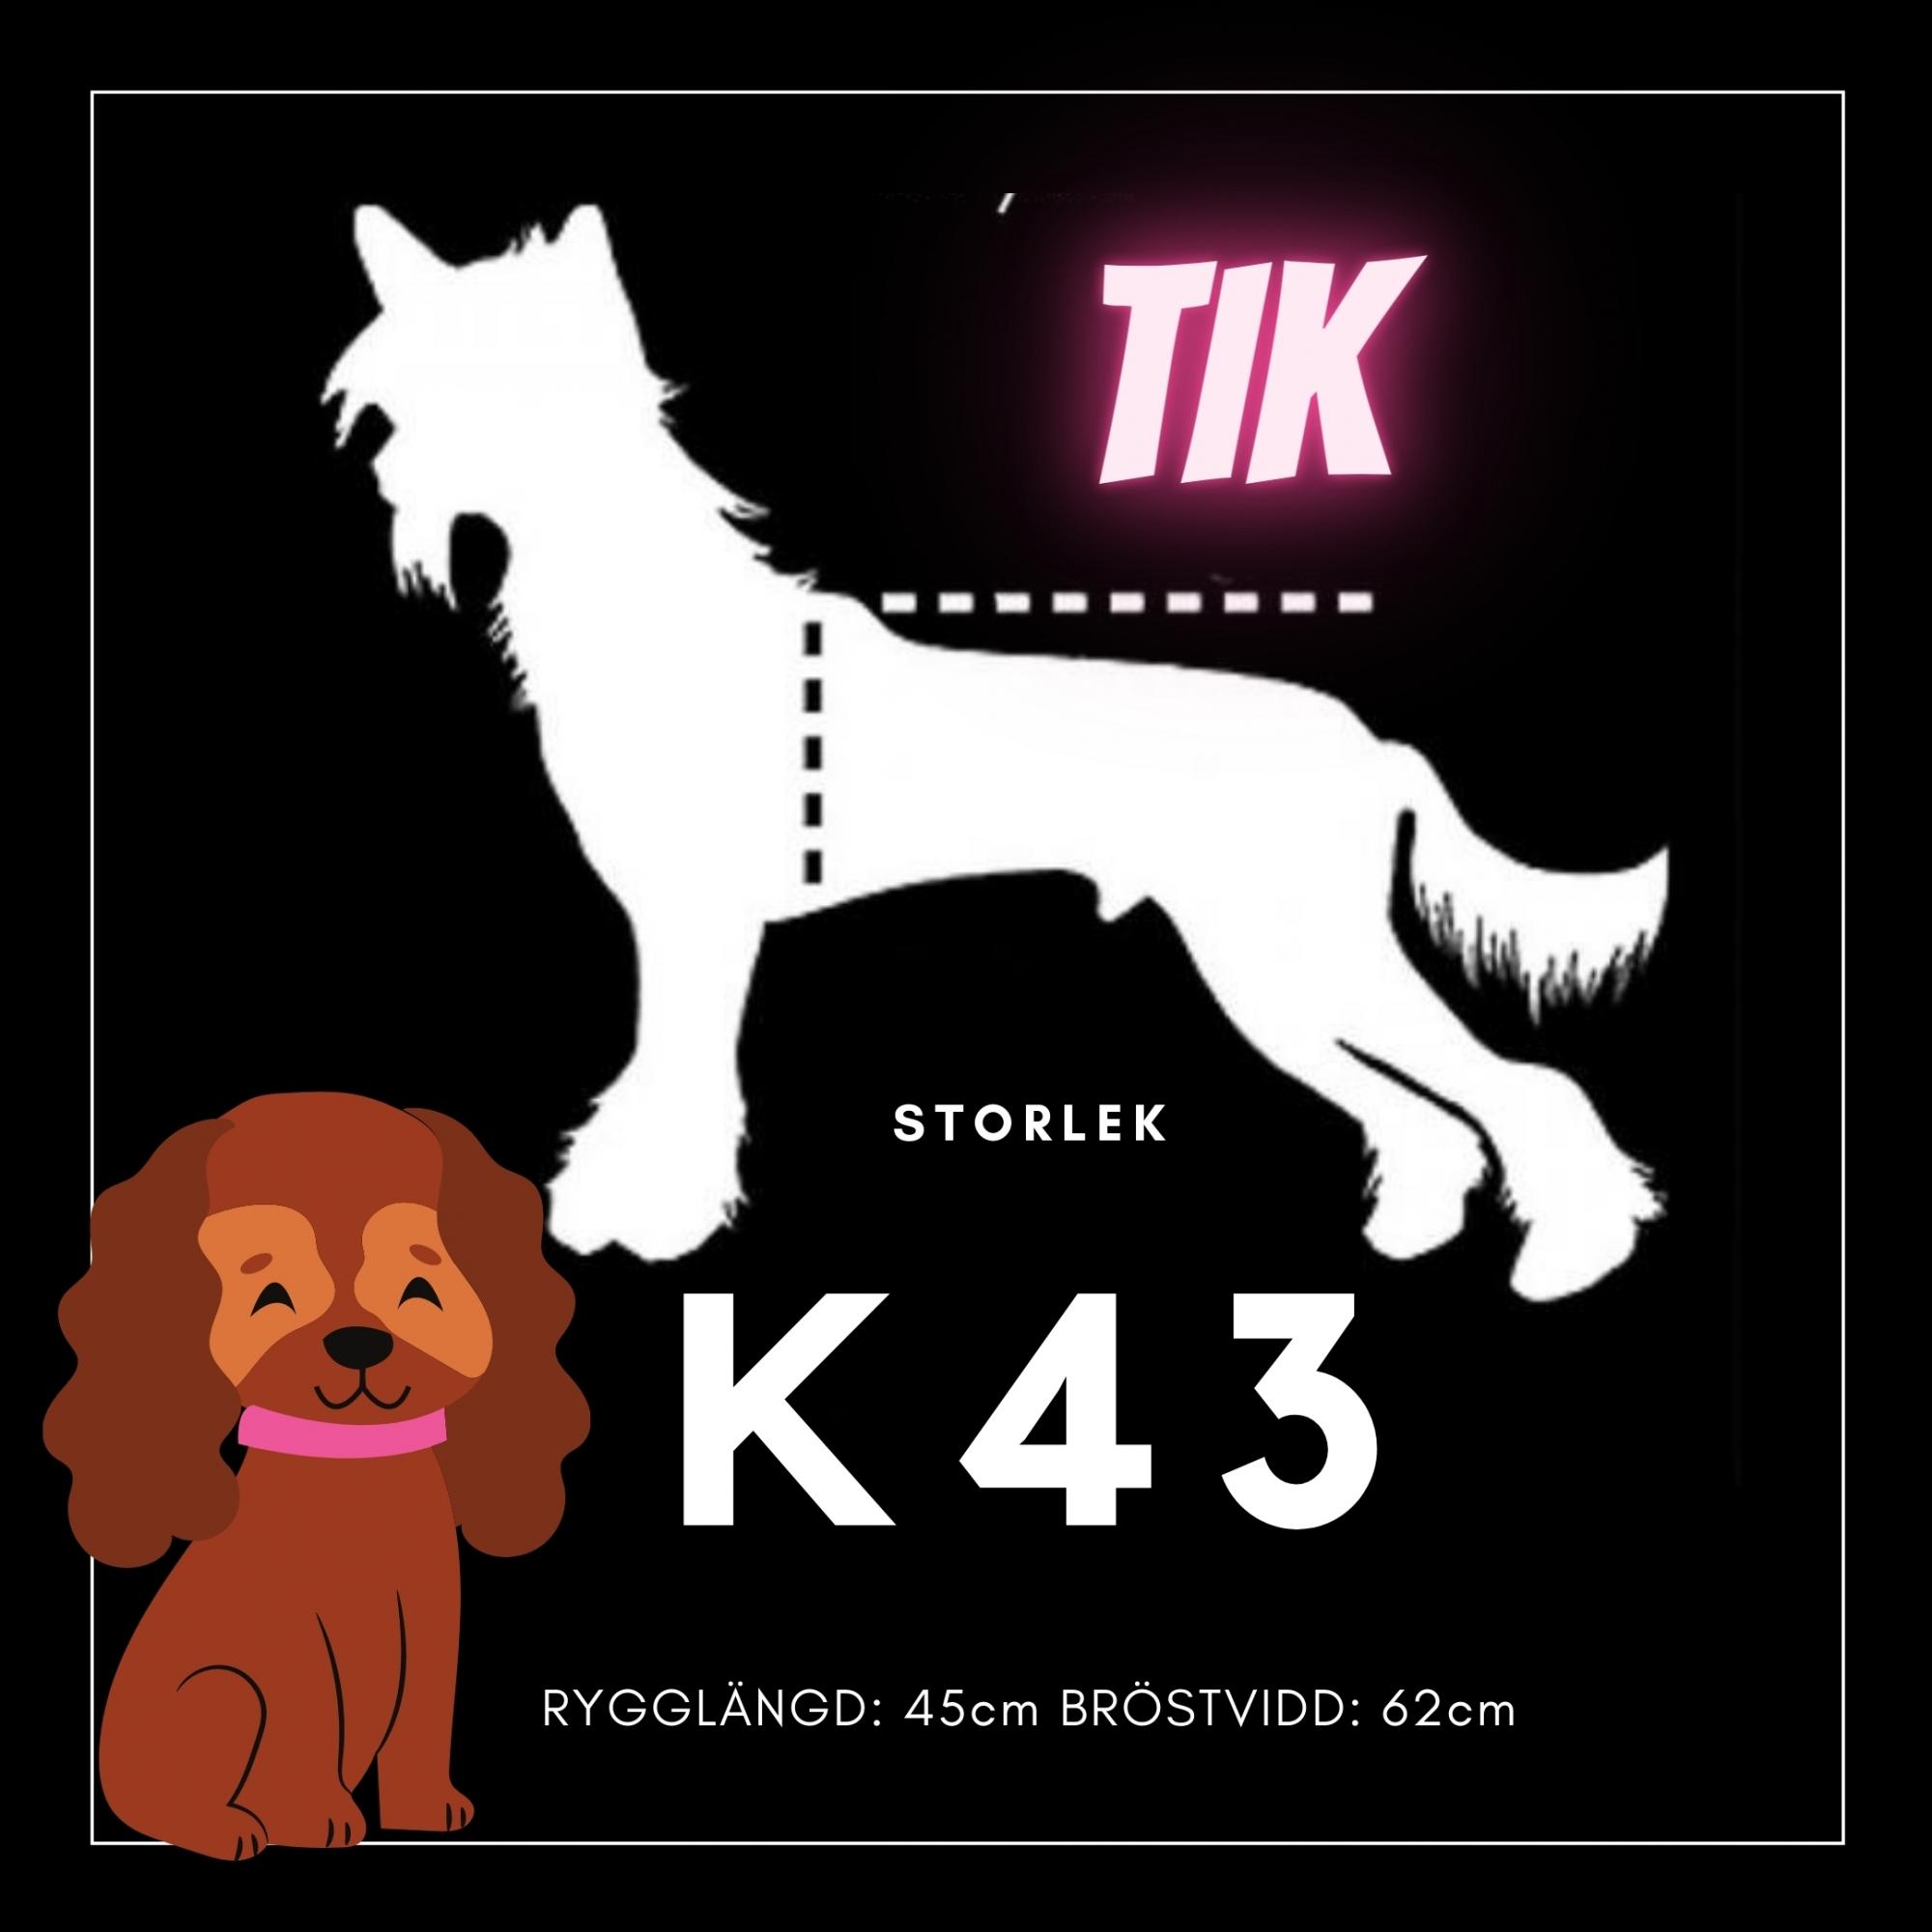 Tik Storlek K43 - Passion For Pet Fashion